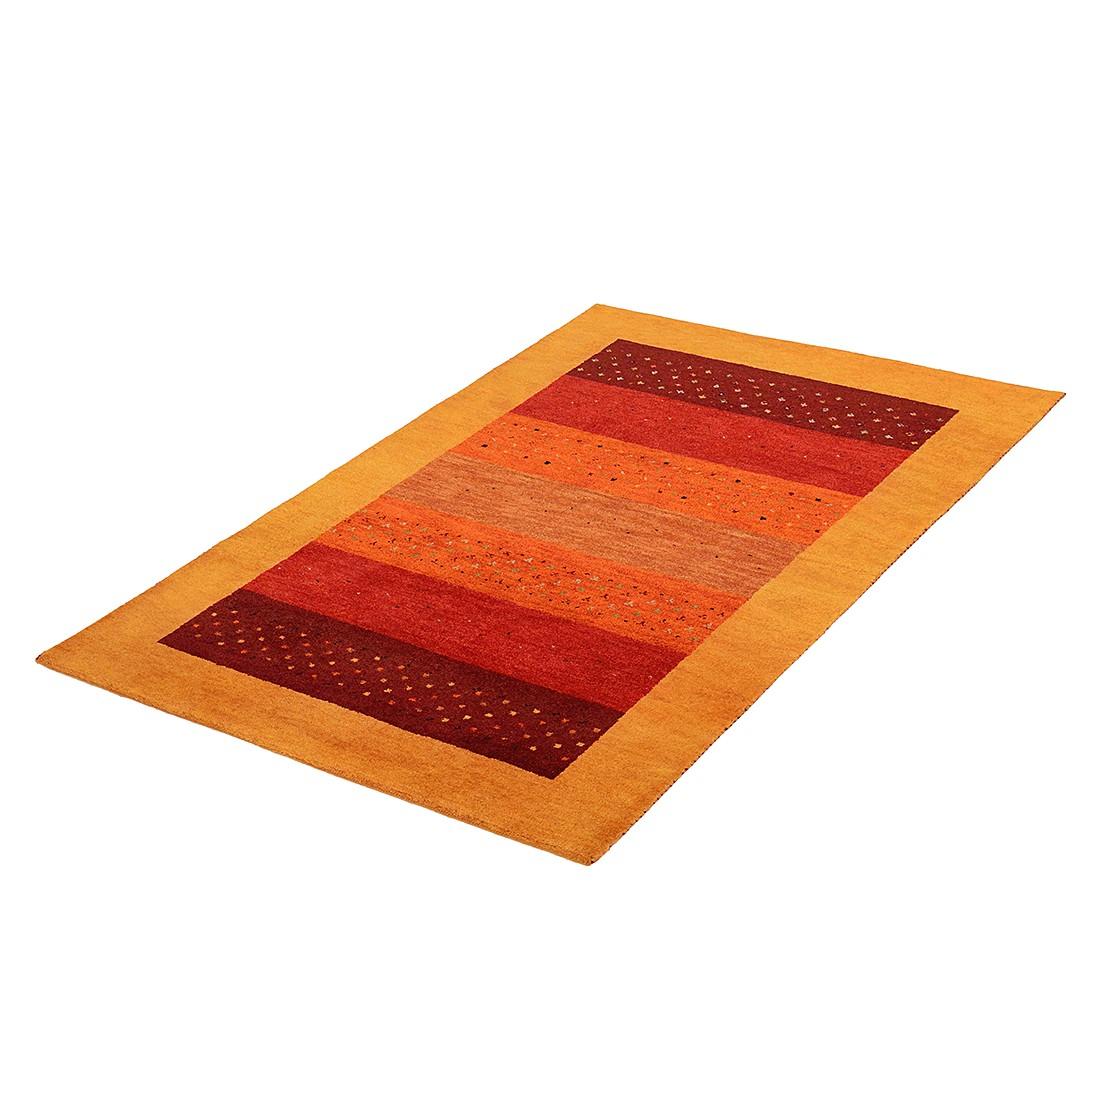 Teppich-Indo Gabbeh Yamunanagar – Rot – 140 x 200 cm, Parwis kaufen